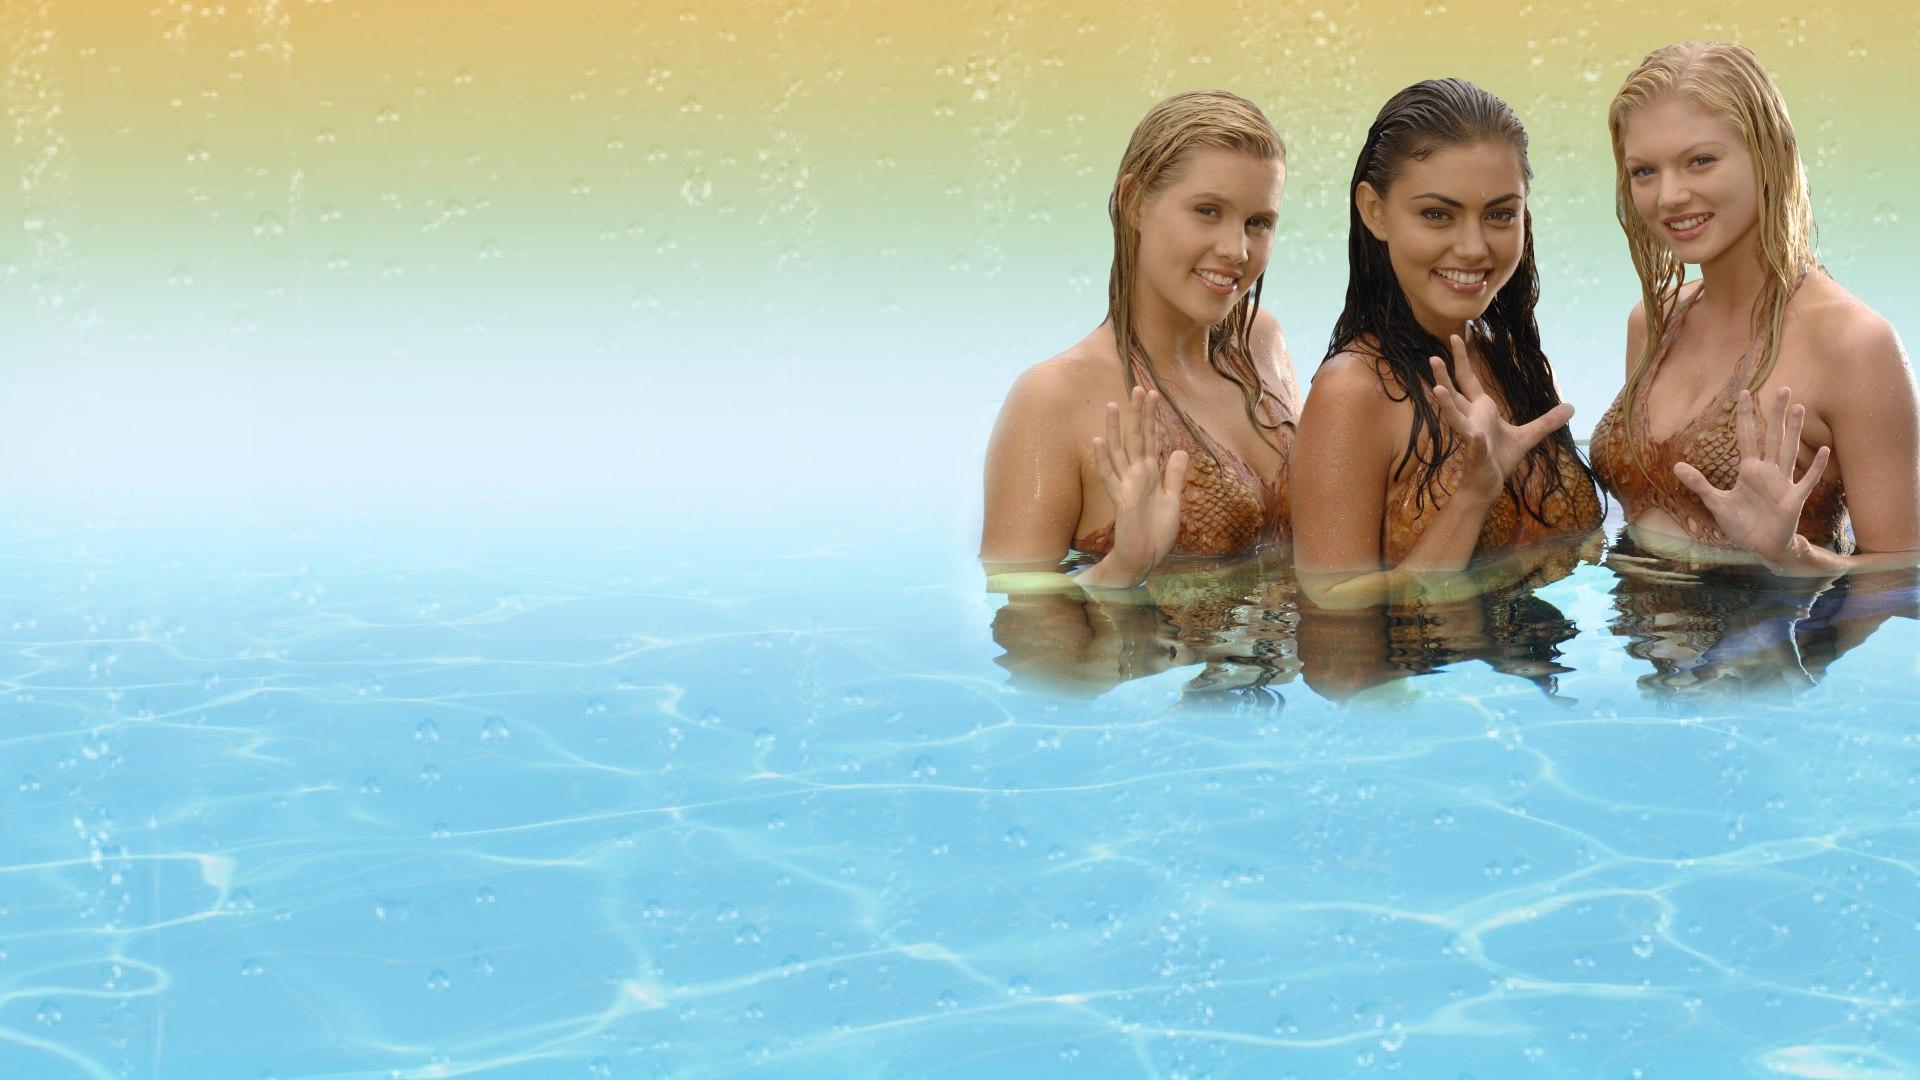 DeaKids +1 H2O: Just Add Water